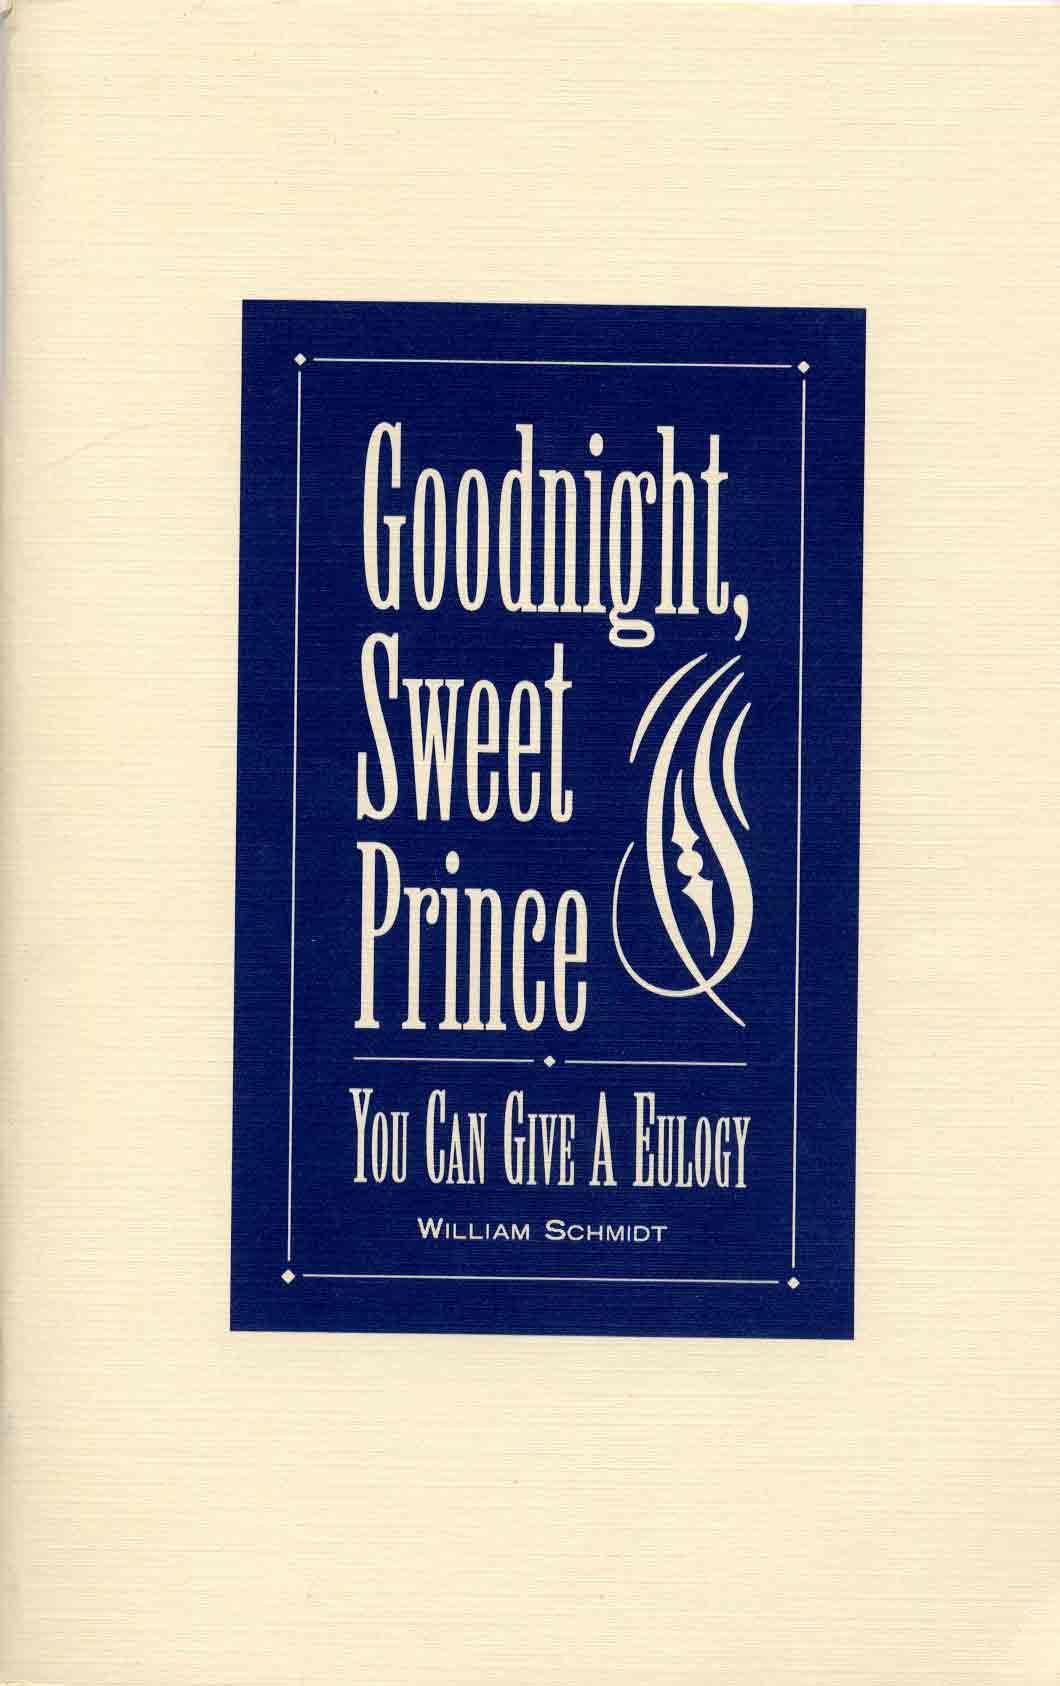 Goodnight, sweet prince